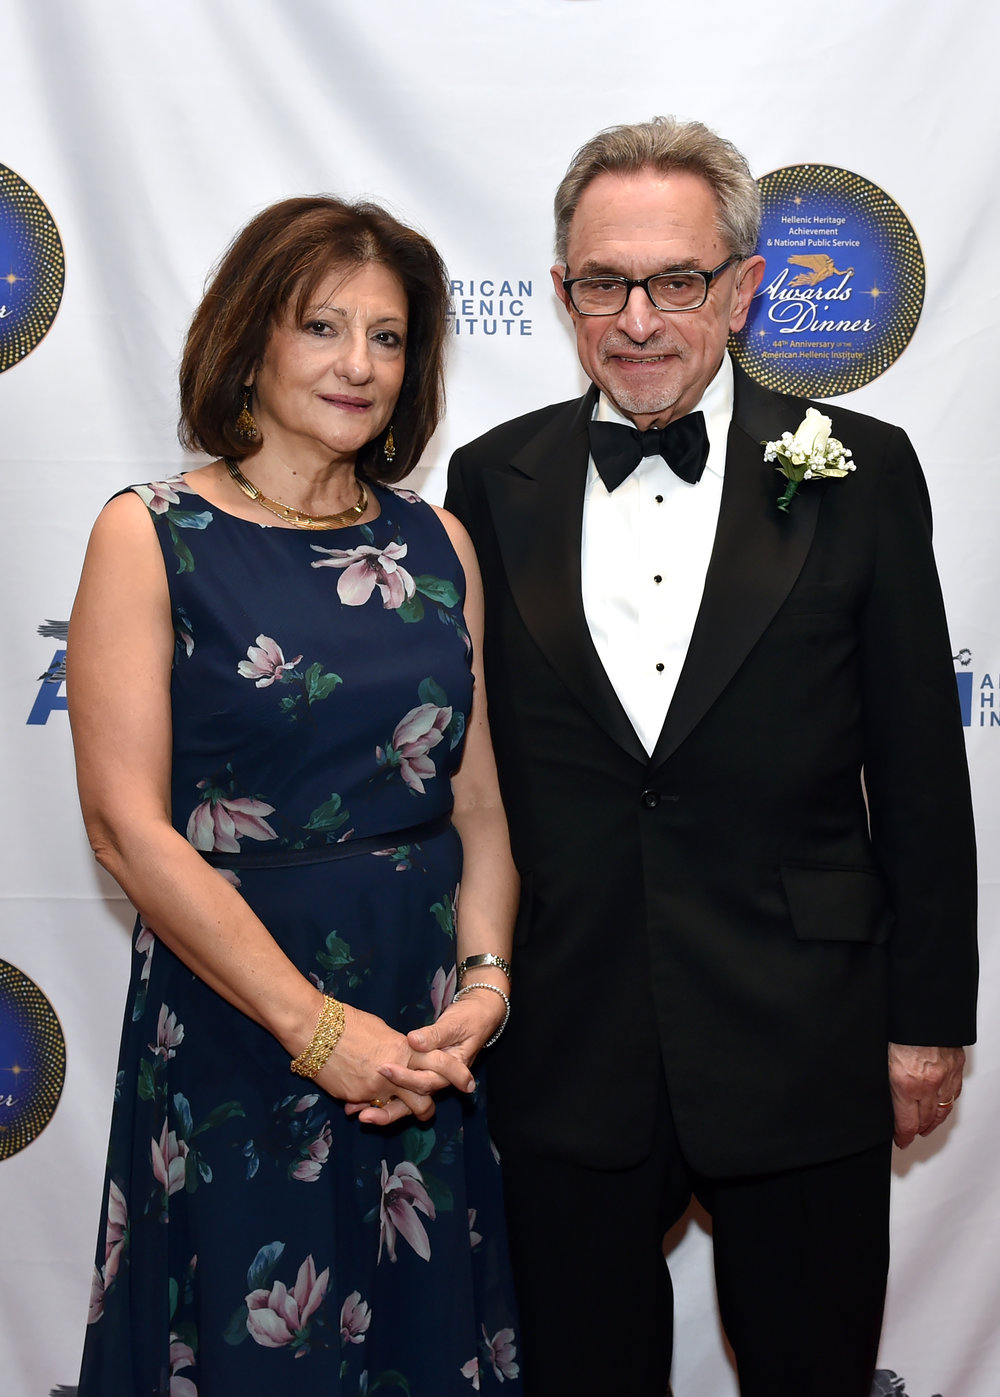 Ambassador Patrick Theros with his wife Aspasia Theros